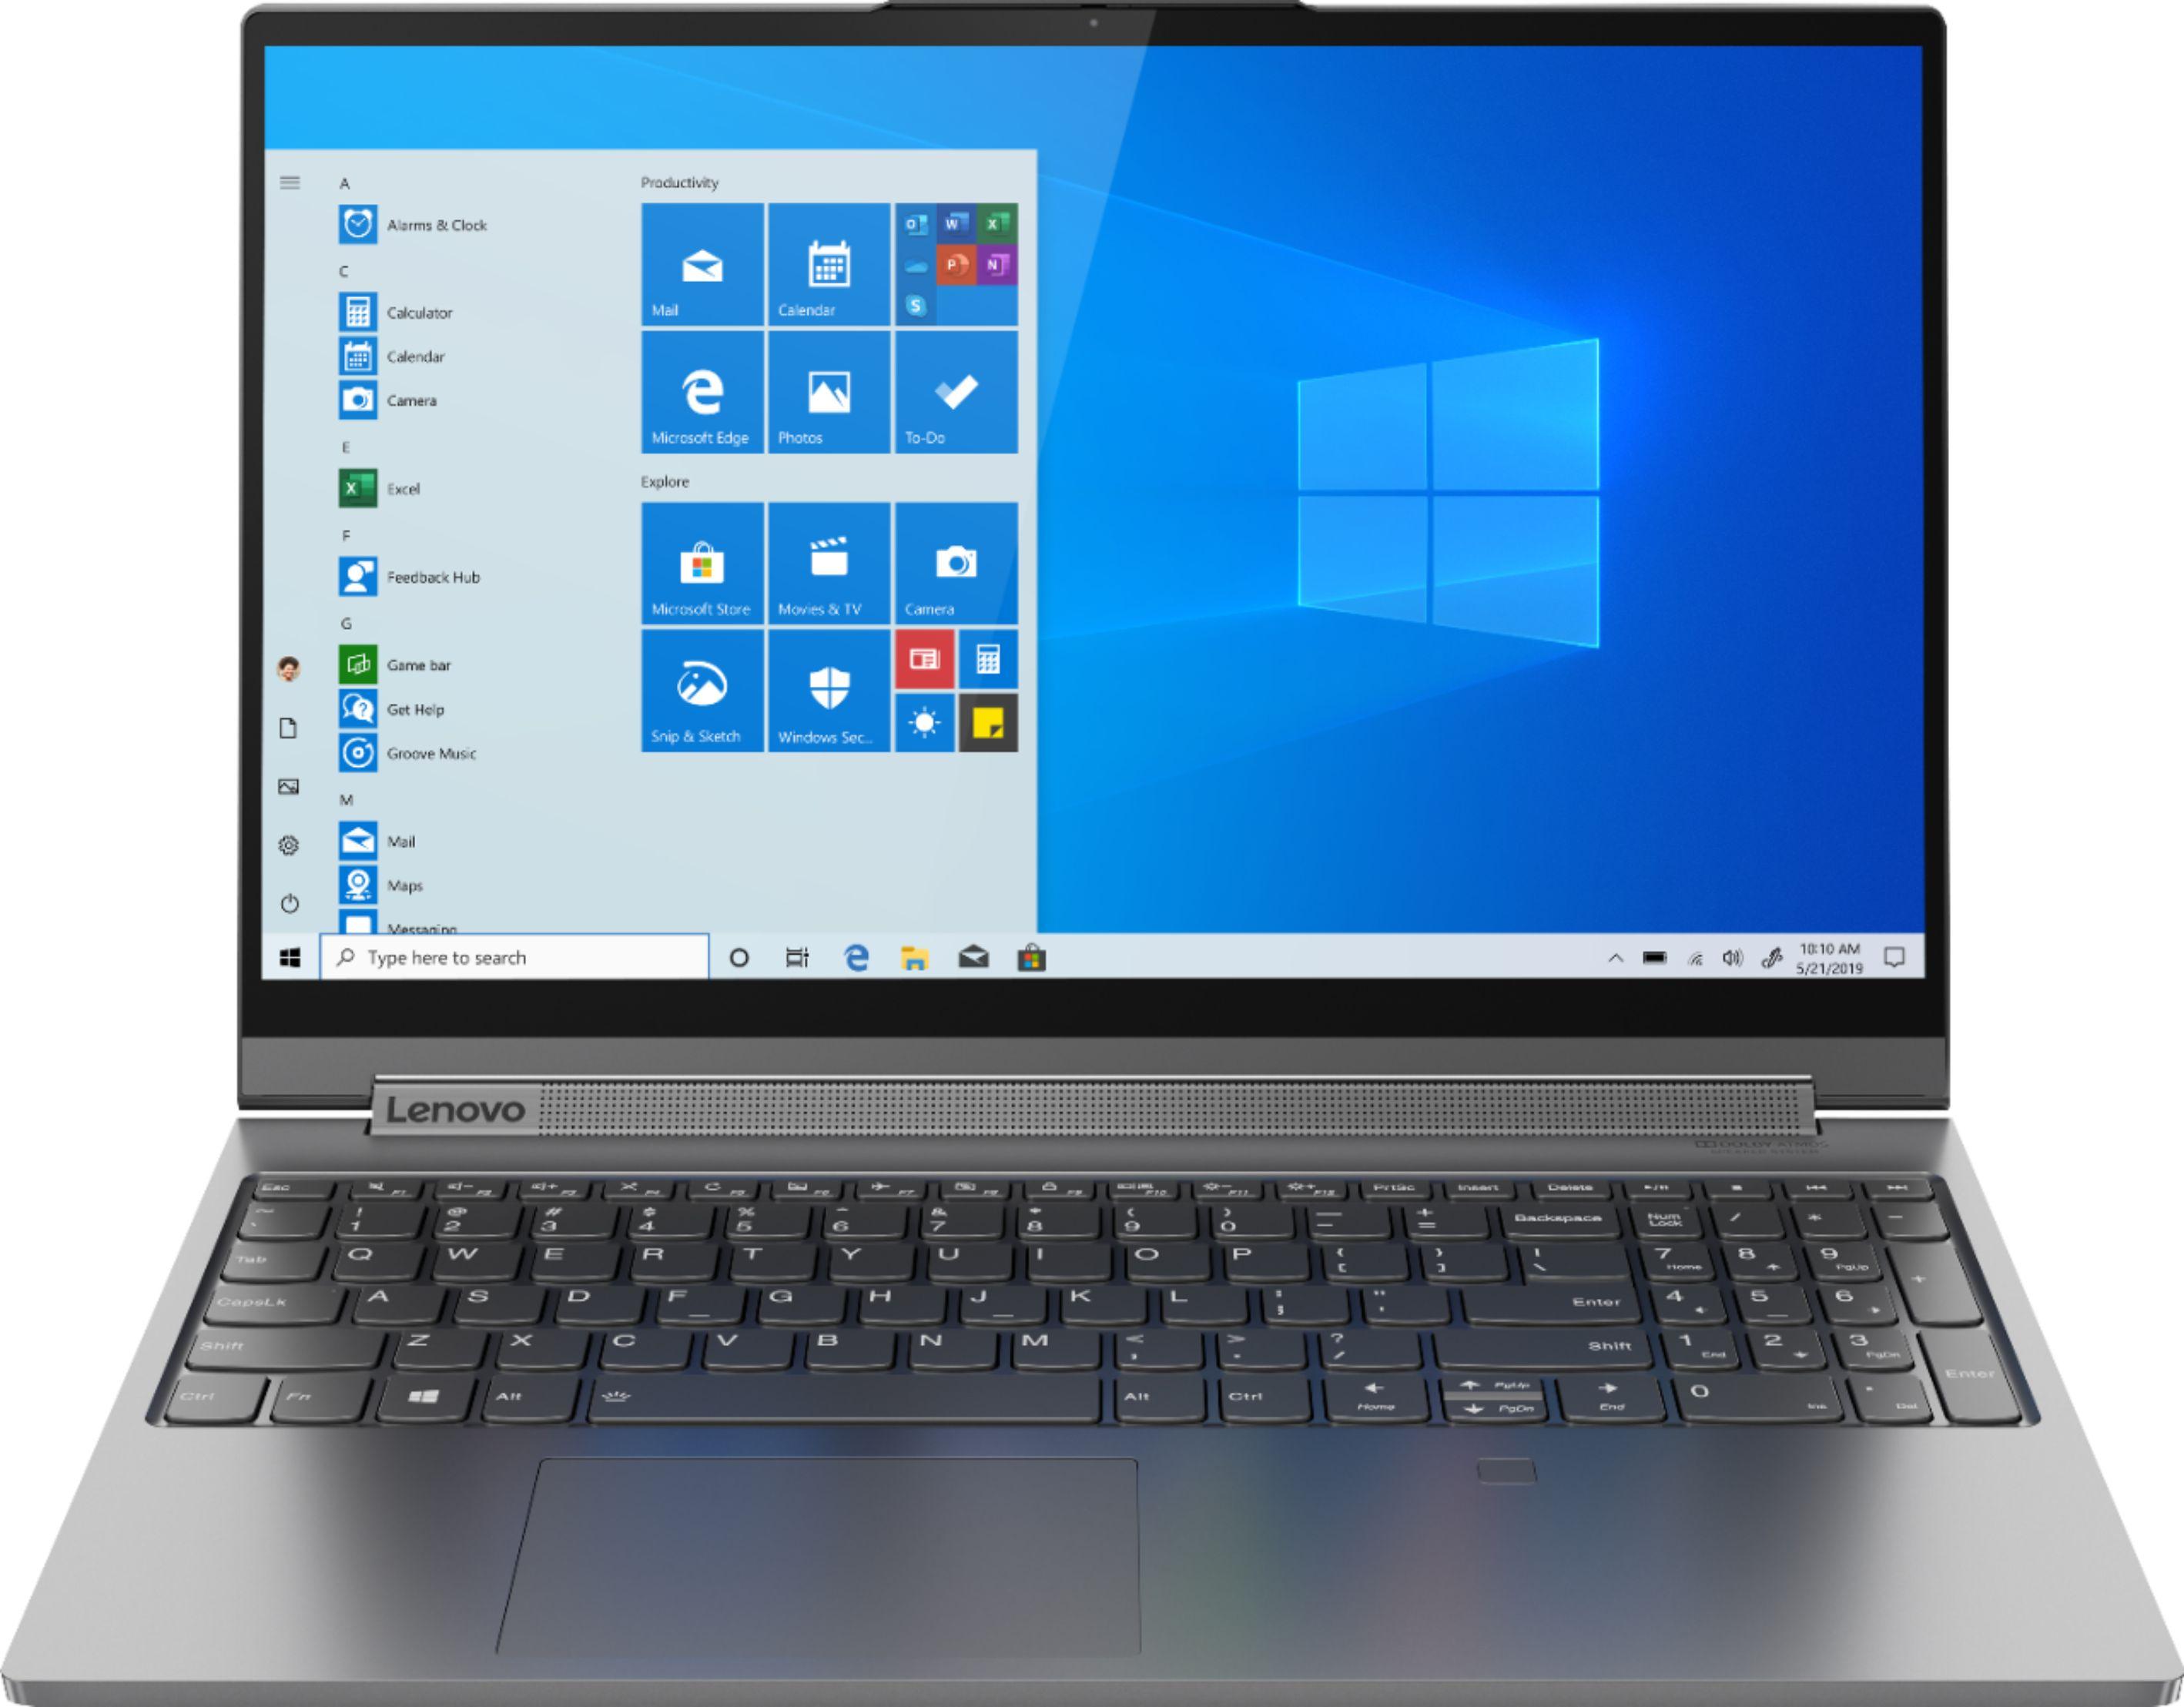 Buy Lenovo – Yoga C940 2-in-1 15.6″ Touch-Screen Laptop – Intel Core i7 – 16GB Memory – NVIDIA GeForce GTX 1650 – 512GB SSD – Iron Gray on PriceBreaks.com